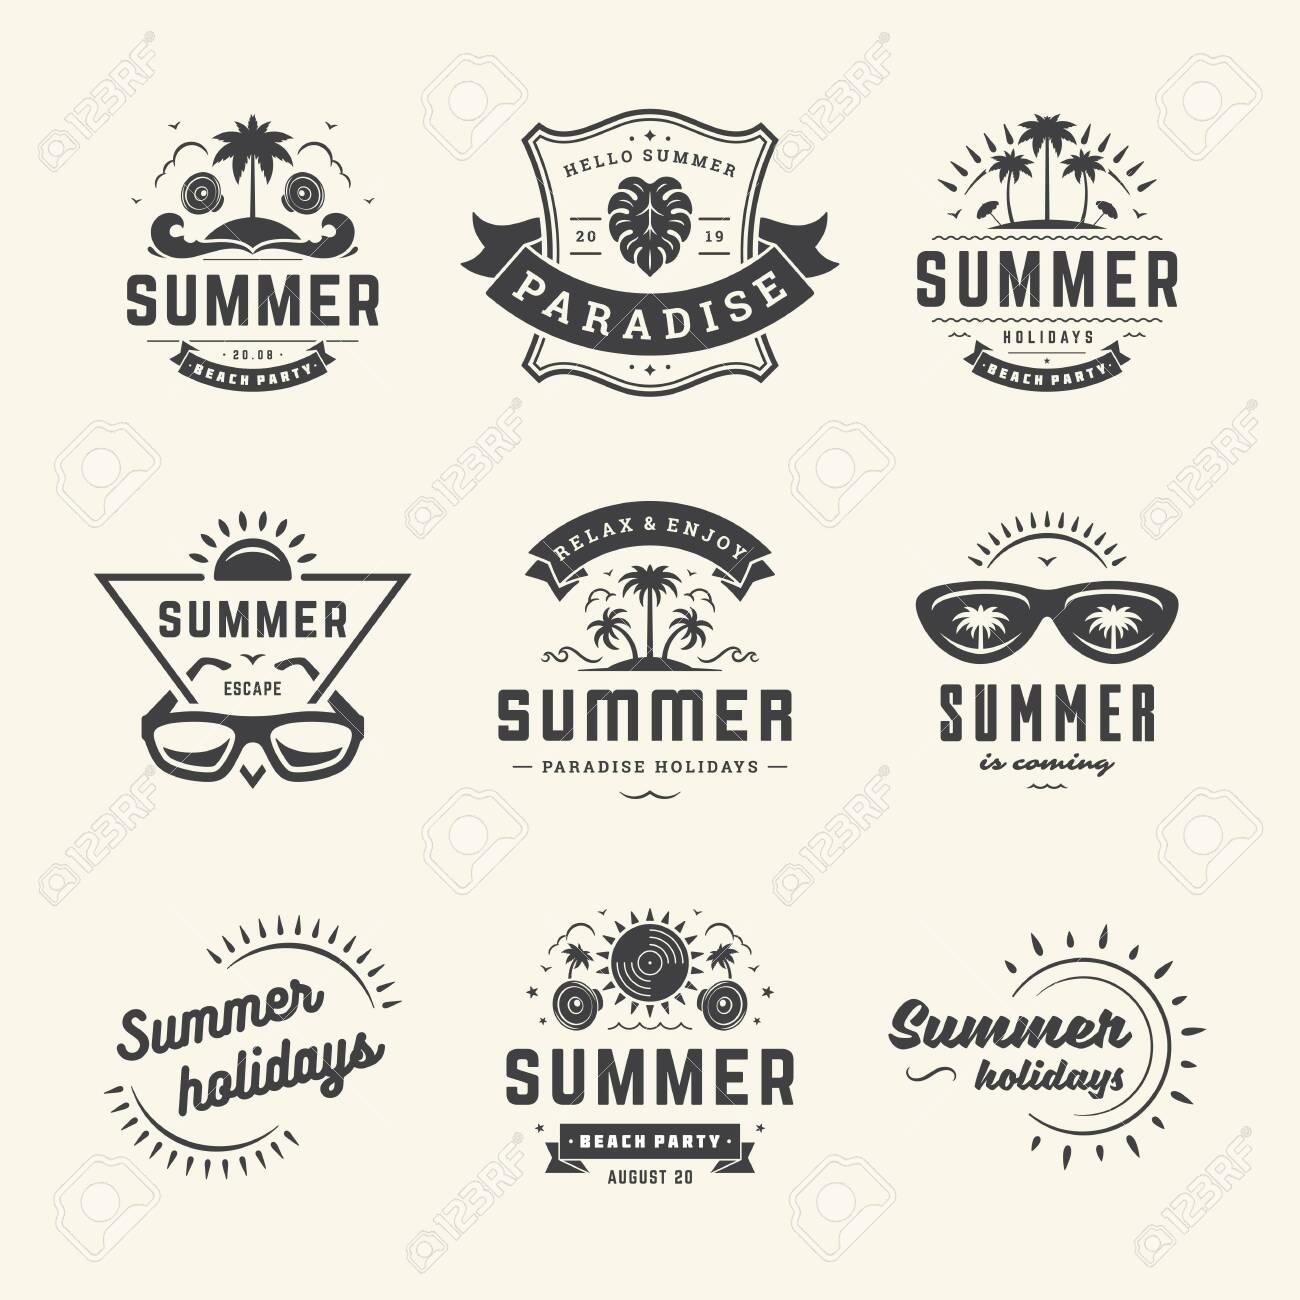 Summer holidays labels and badges retro typography design set. - 151009168